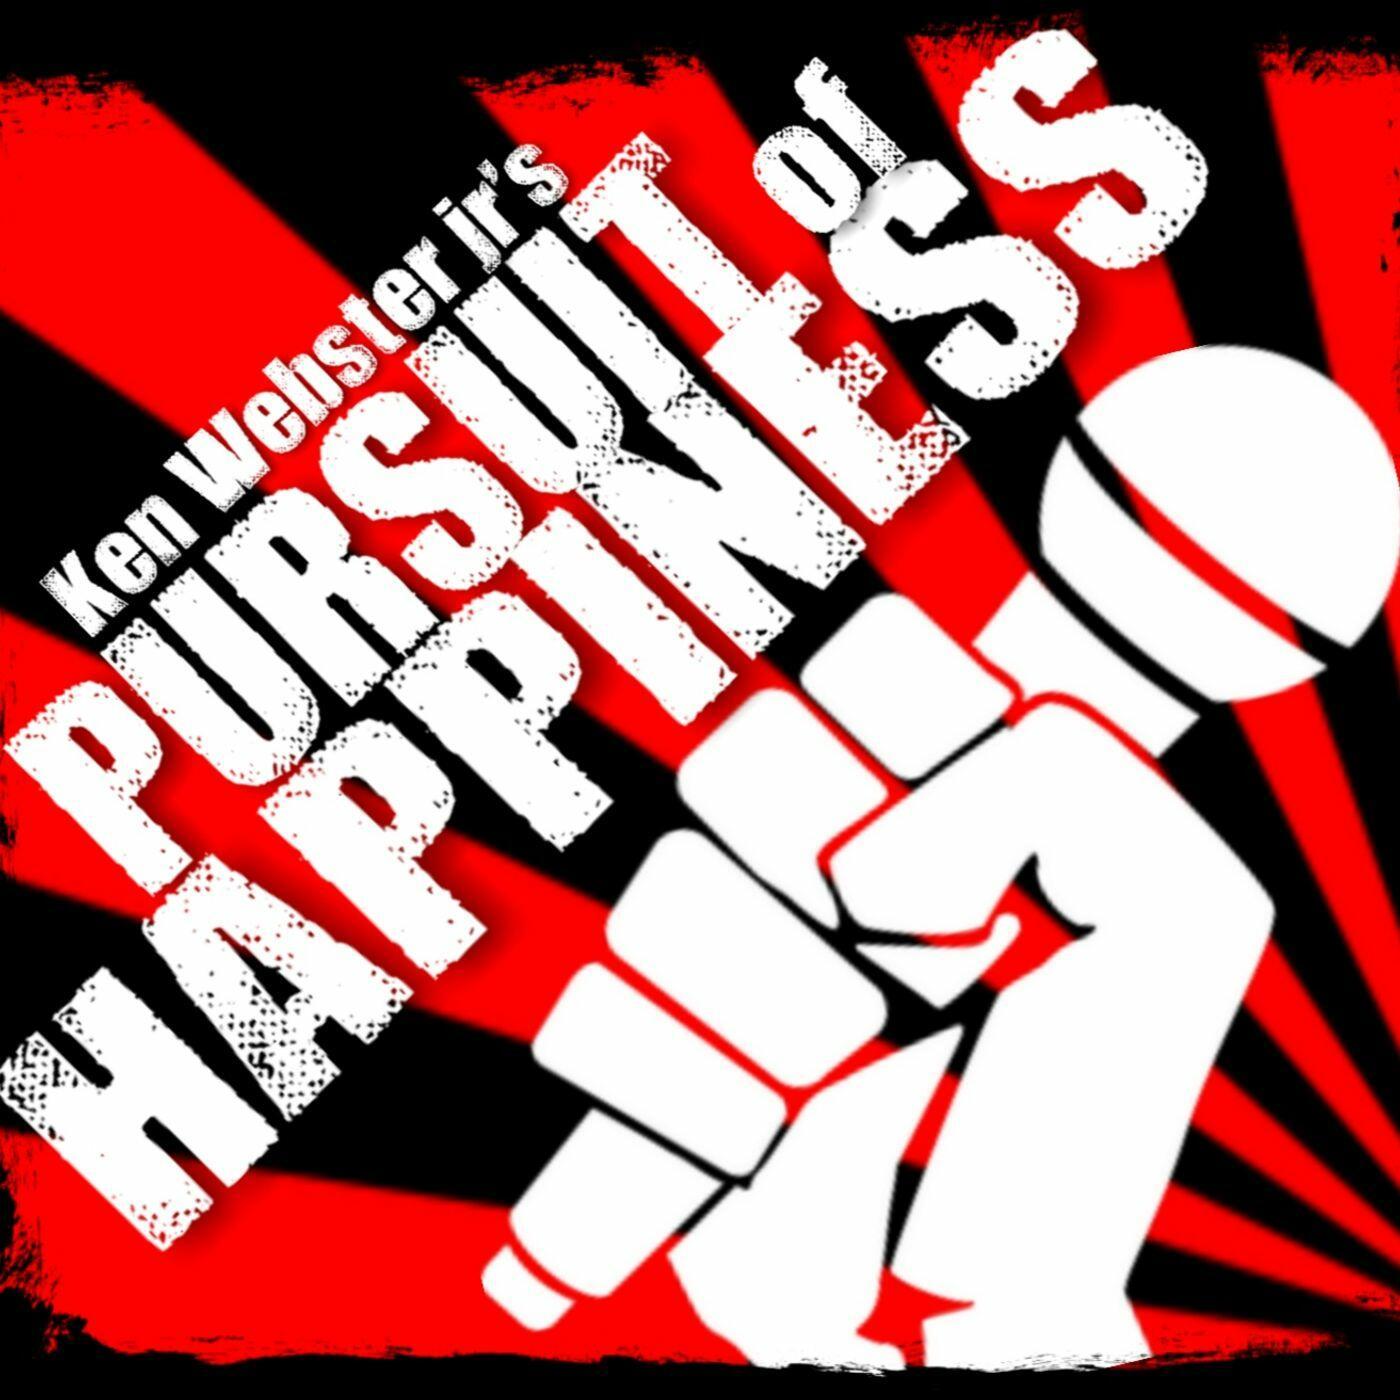 Ken Webster Jr's Pursuit of Happiness